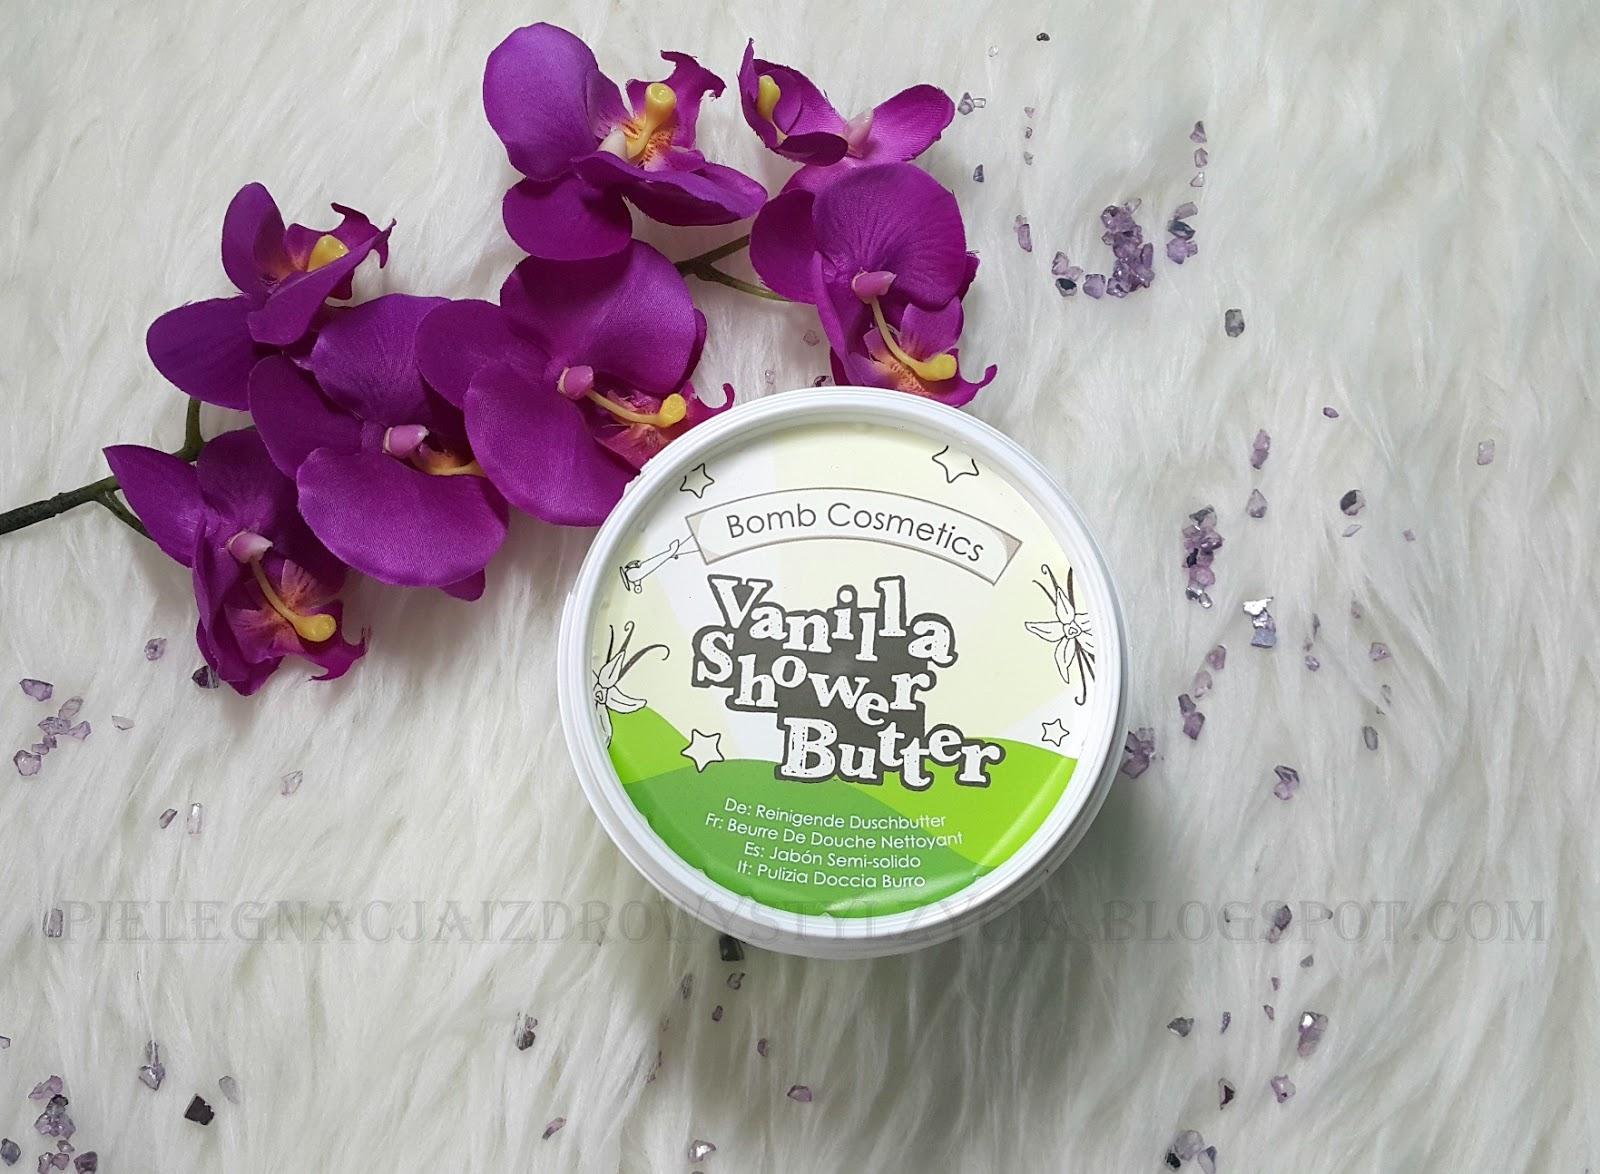 Bomb Cosmetics masło pod prysznic lody waniliowe - Vanilla Shower Butter